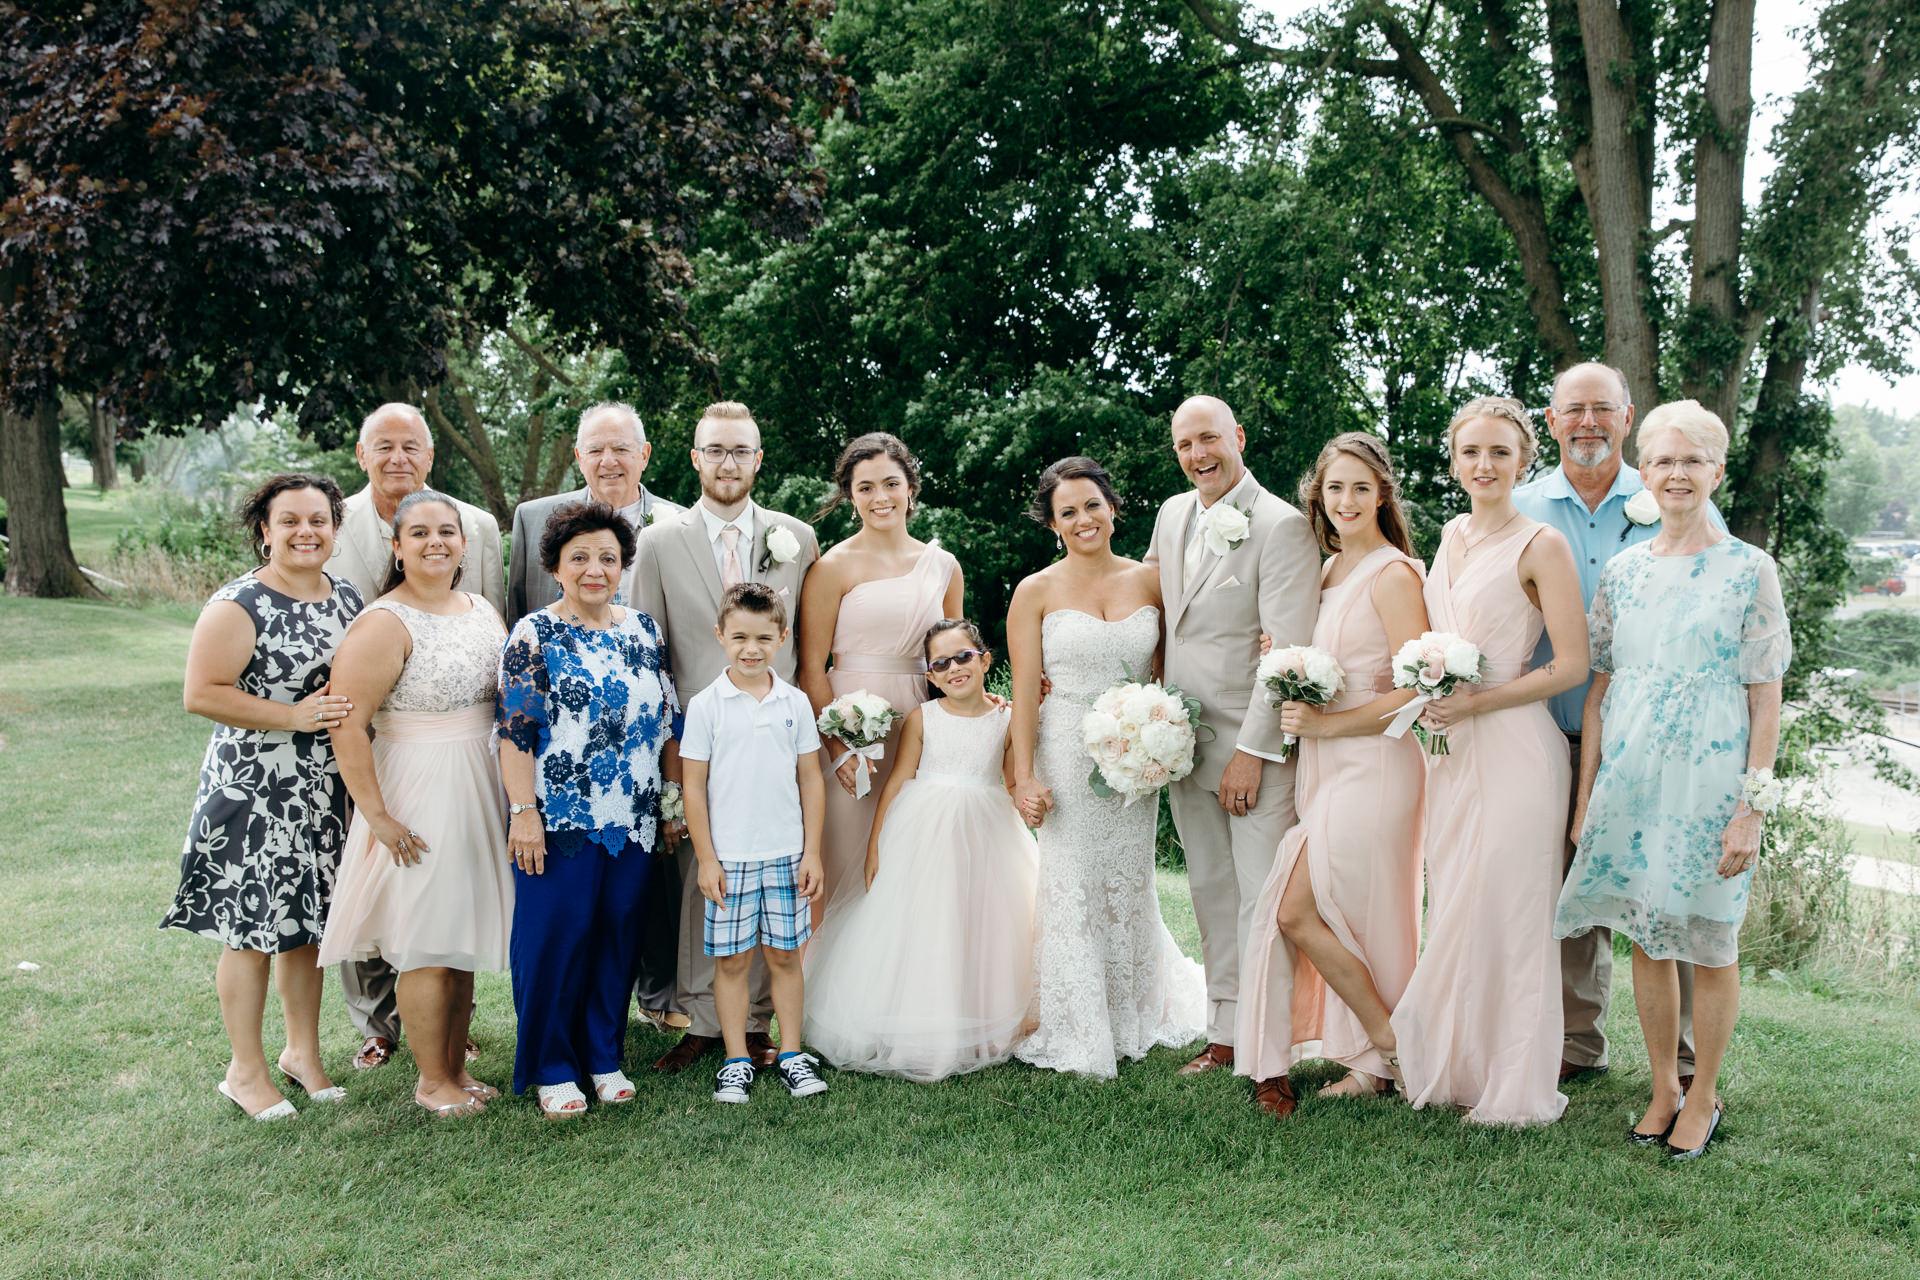 Grant Beachy Tammy Chris wedding photography goshen Saint Joseph veranda whitcomb-053.jpg